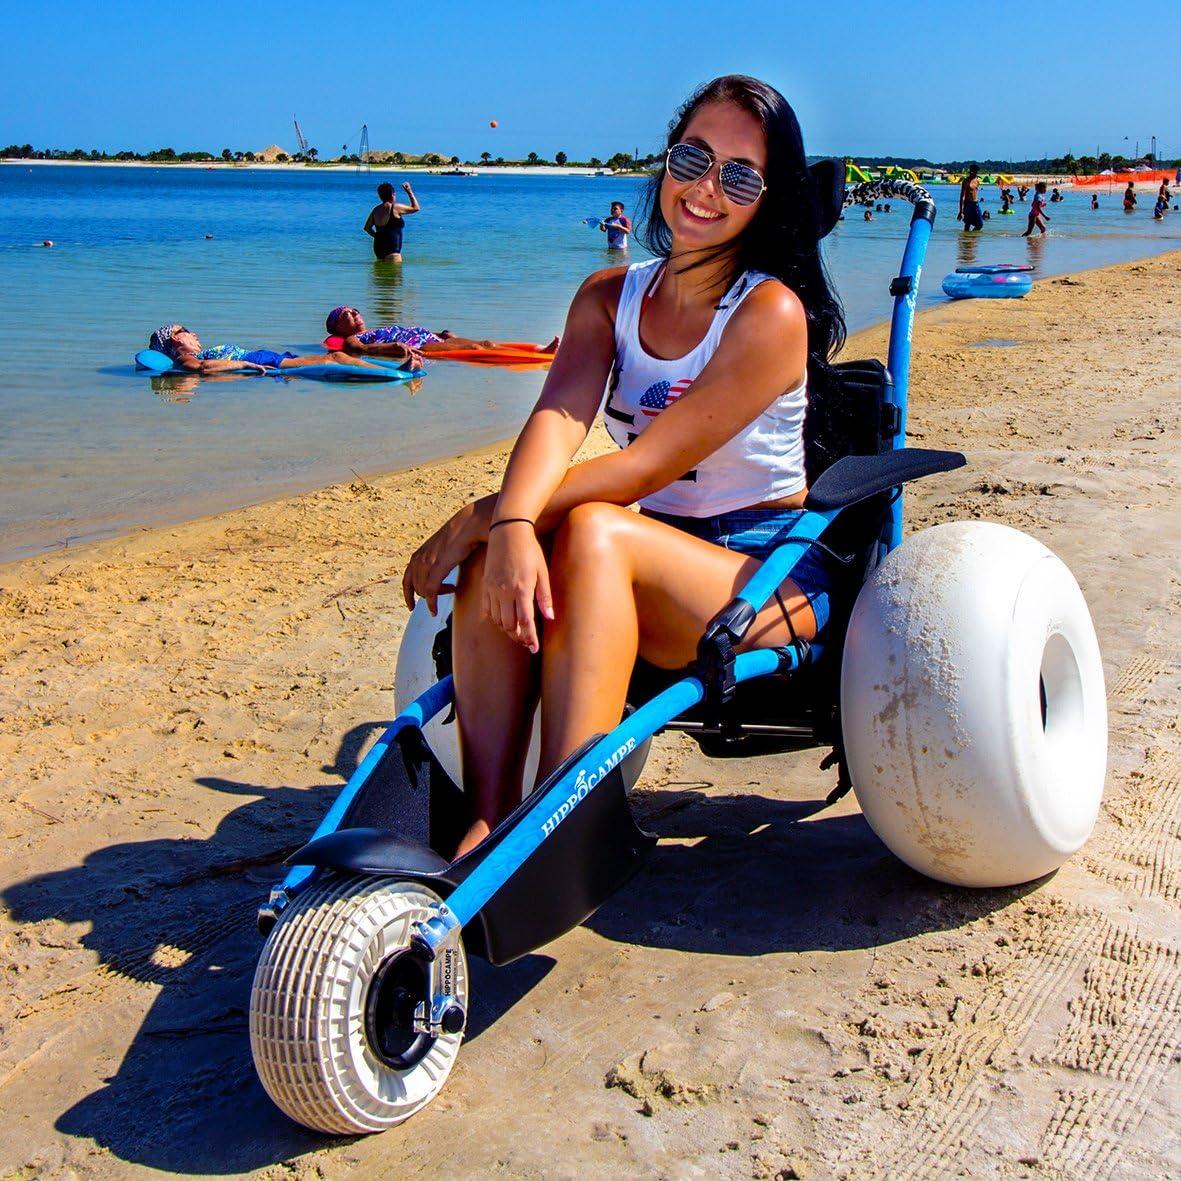 HIPPOCAMPE All Terrain Recommended Beach Wheelchair -Balloon Tir security Medium Size